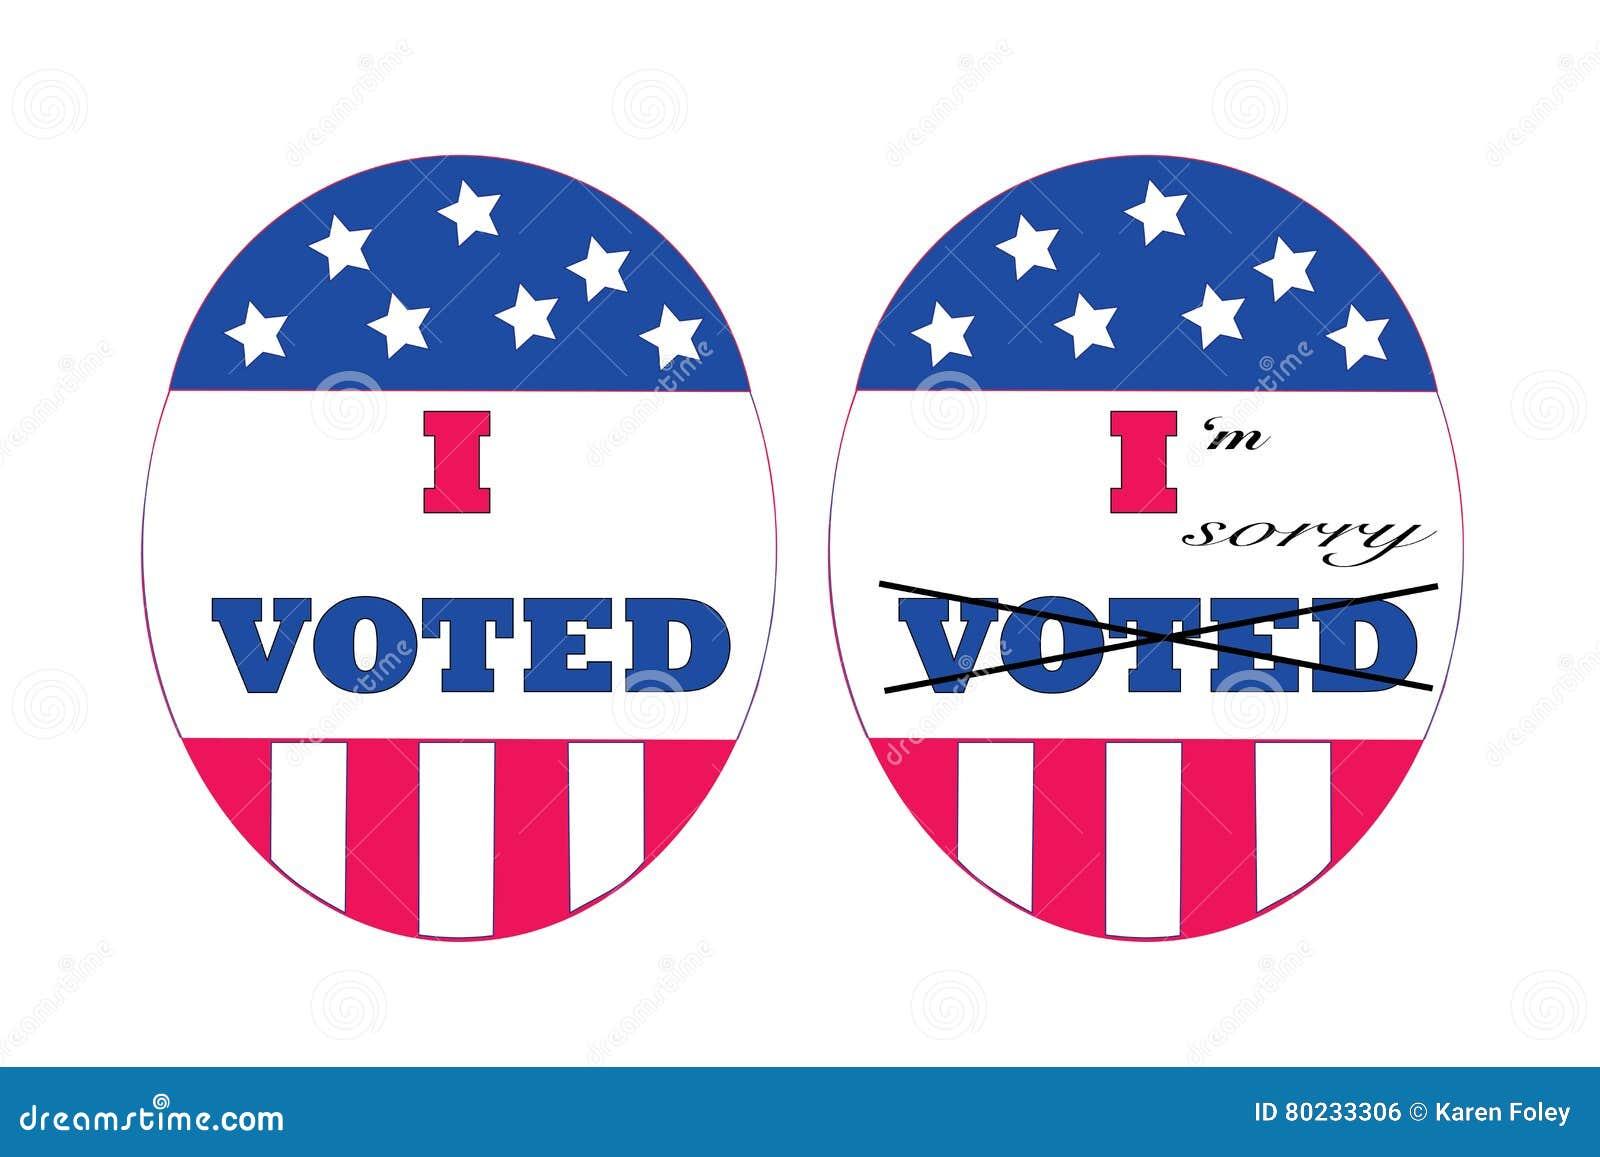 Voters remorse stock vector. Illustration of guilt, remorse - 80233306